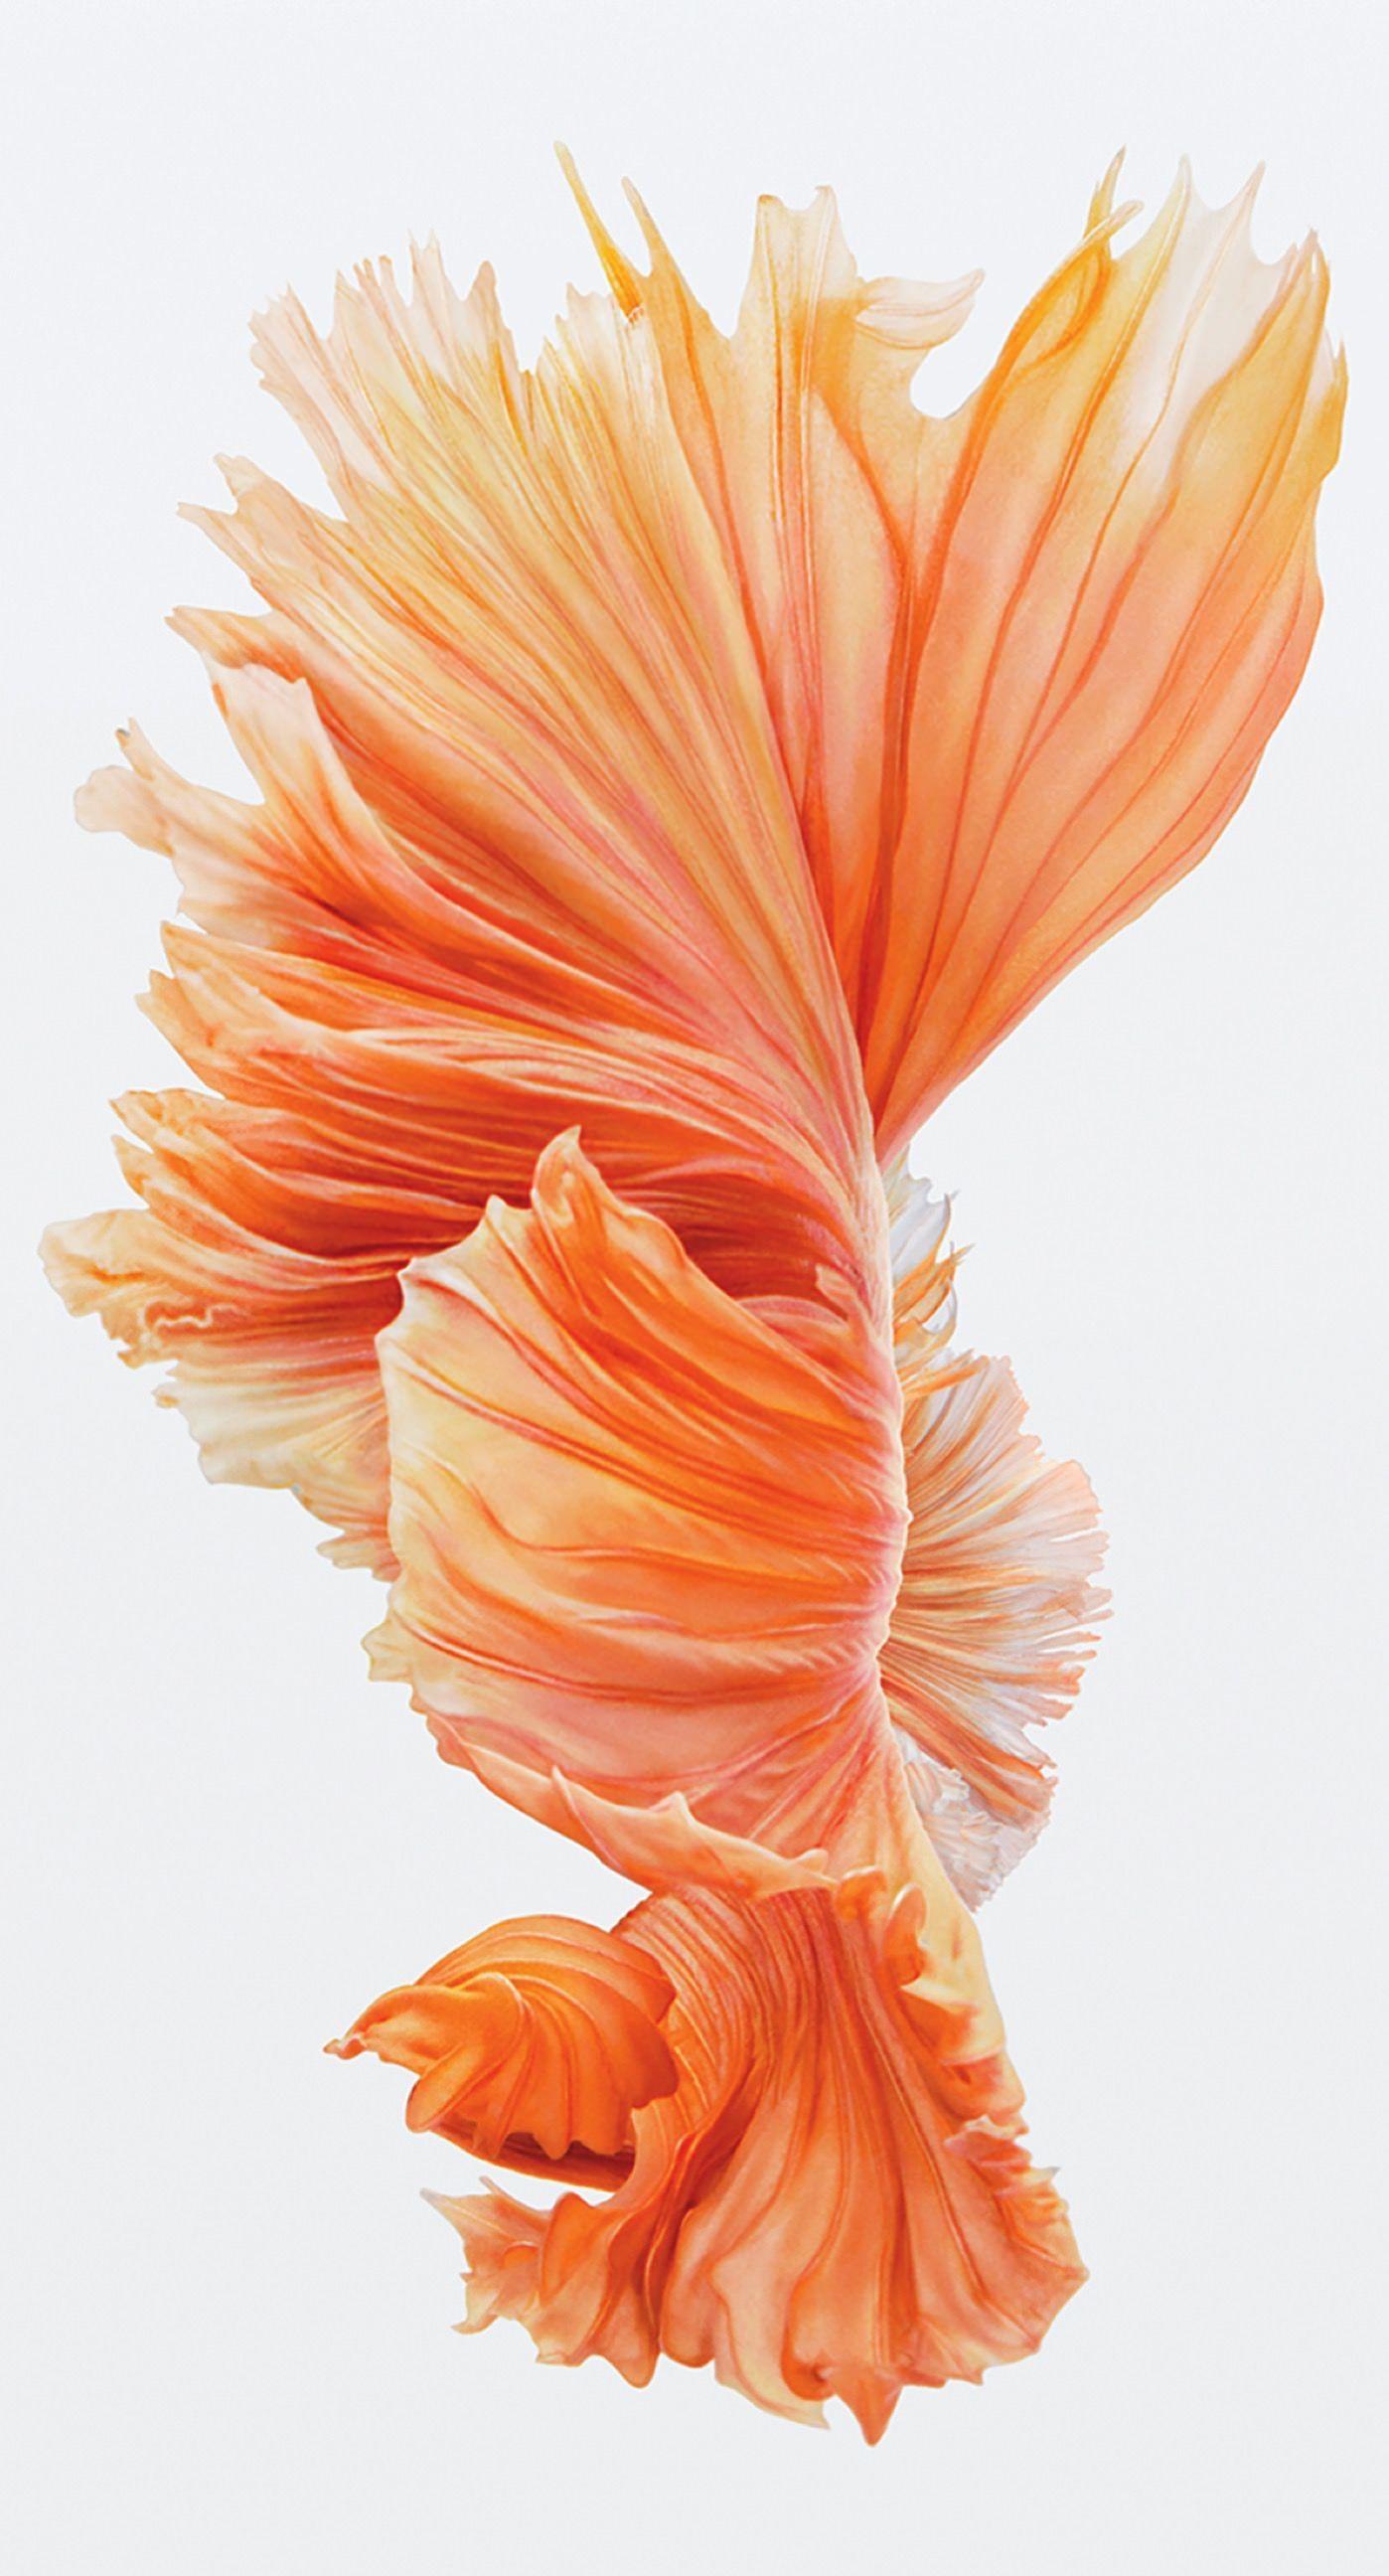 Iphone 6s Fish Wallpaper Iphone 6s Plus 124275 Hd Wallpaper